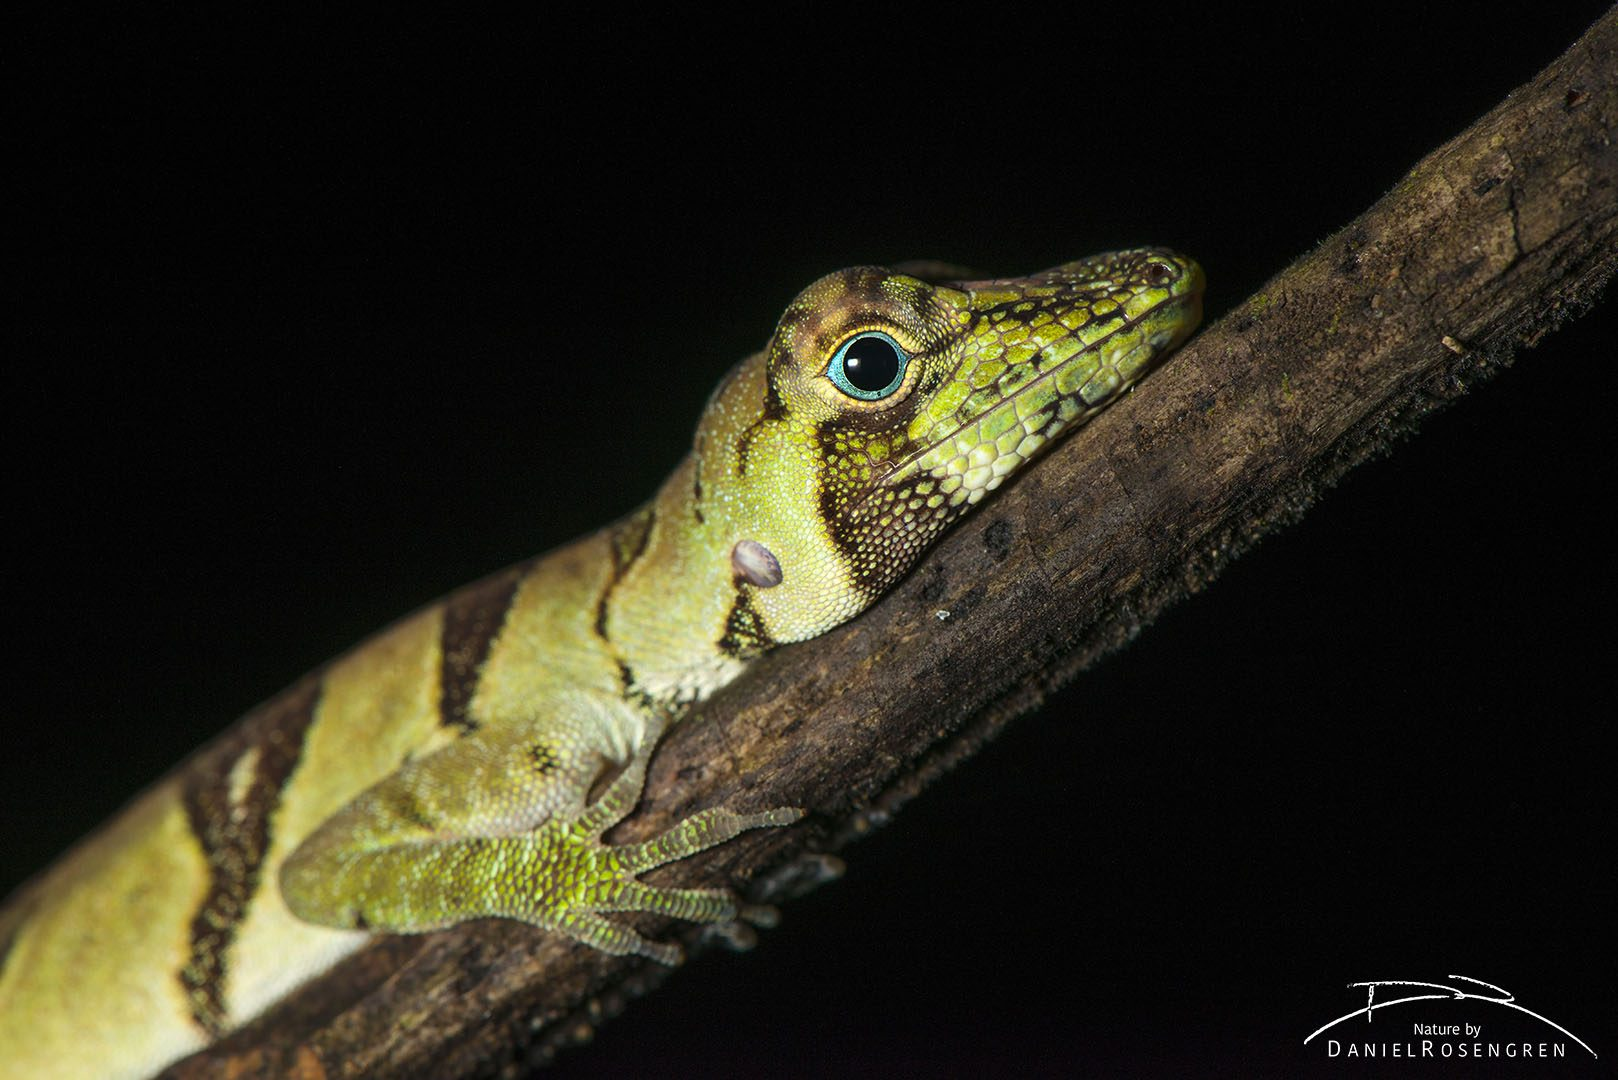 A lizard in Yaguas. © Daniel Rosengren